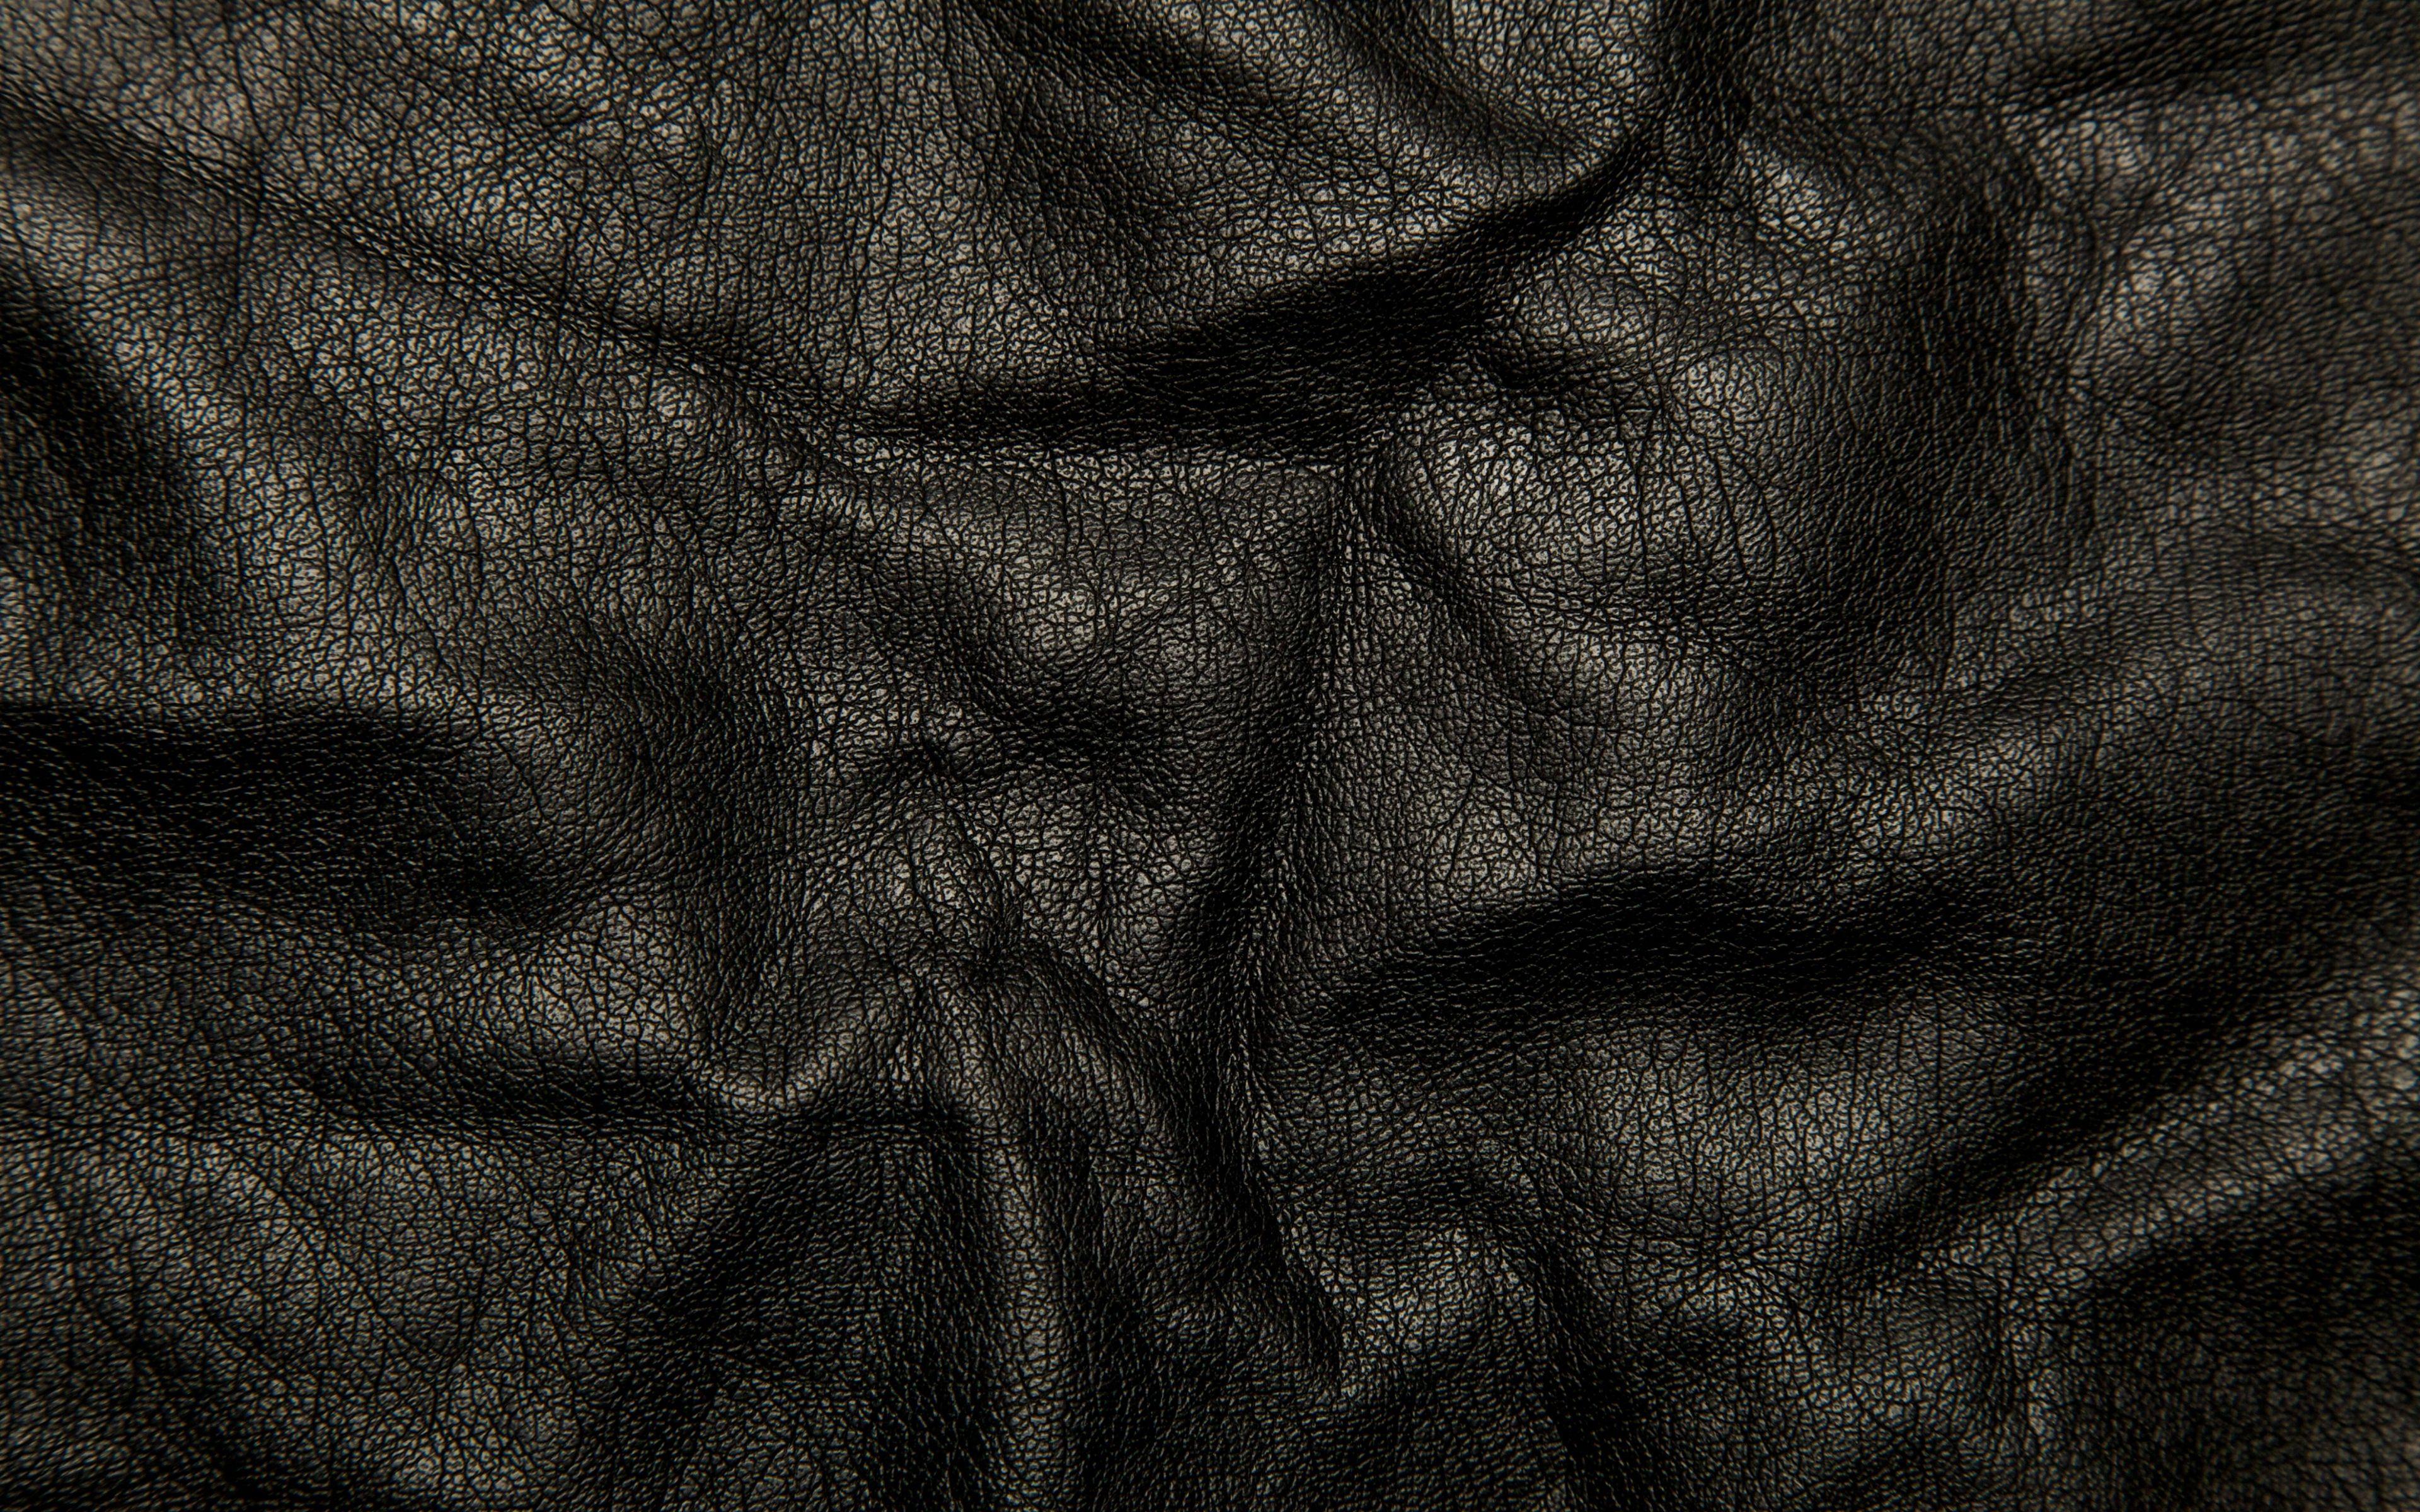 Download Wallpaper 3840x2400 Leather Black Background Texture Wrinkles Cracks Ultra Hd 4k Hd Bac Background Texture Wallpaper Images Hd Textured Wallpaper